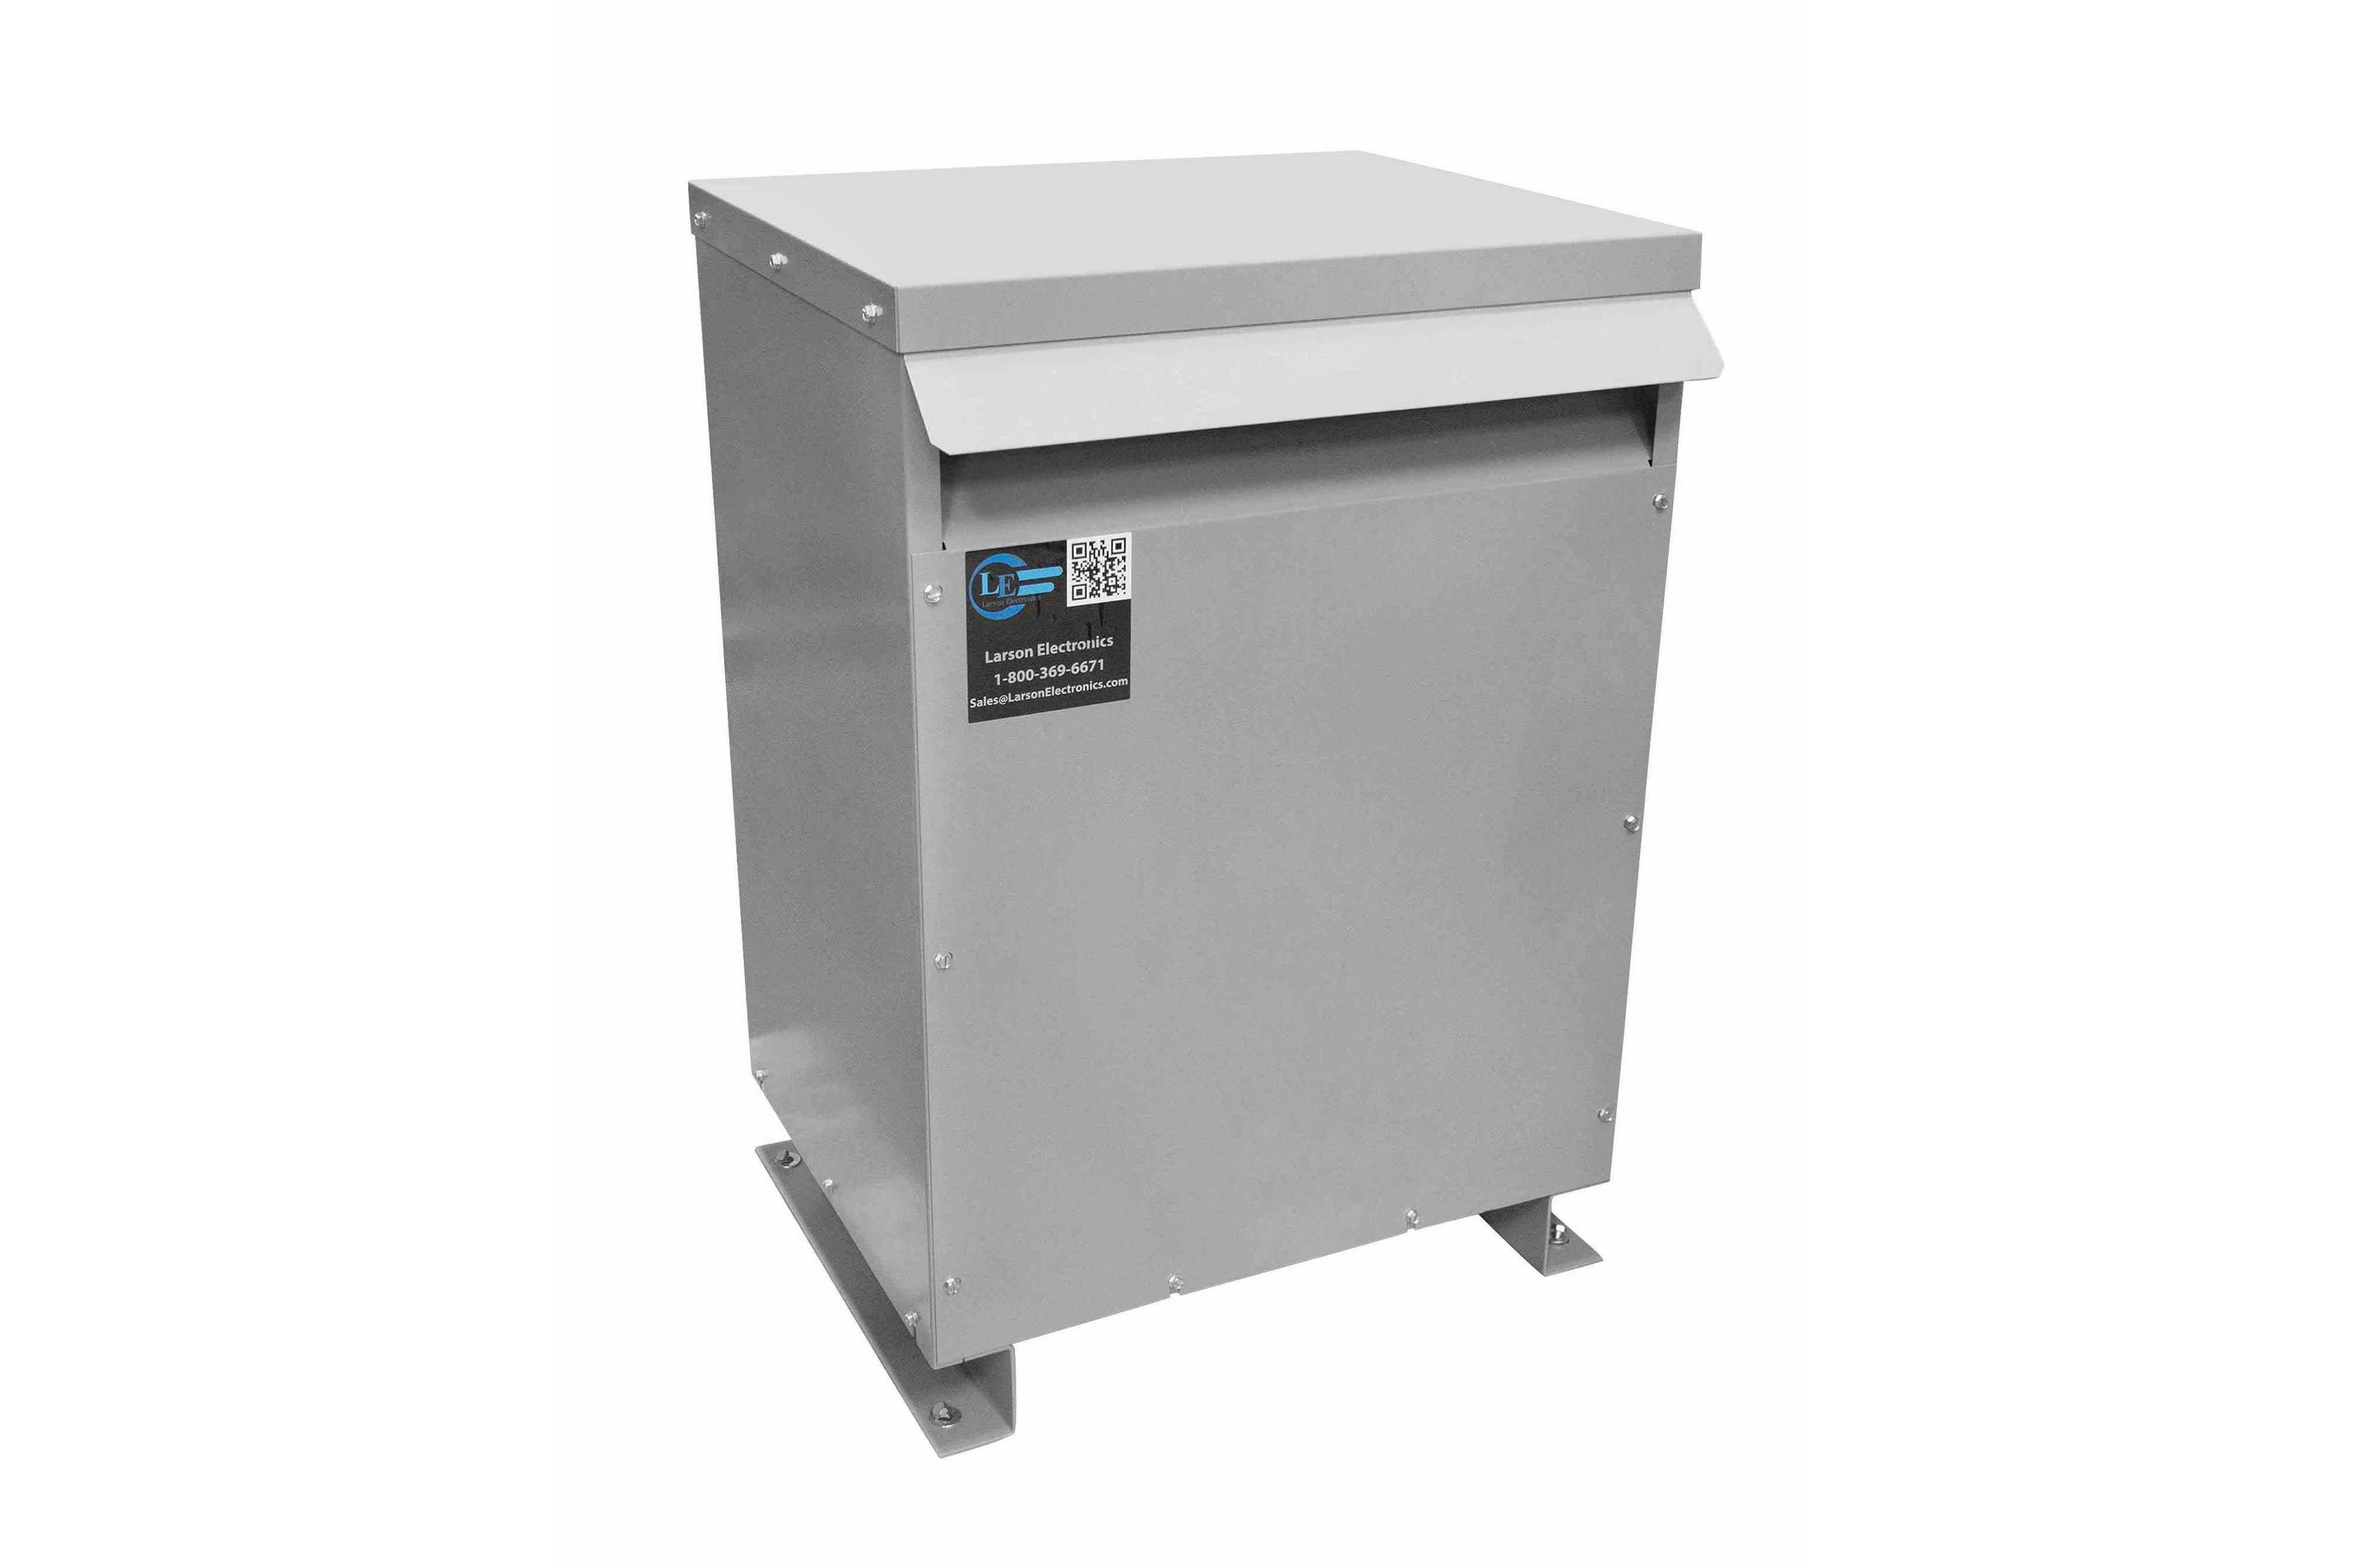 38 kVA 3PH Isolation Transformer, 208V Wye Primary, 480V Delta Secondary, N3R, Ventilated, 60 Hz